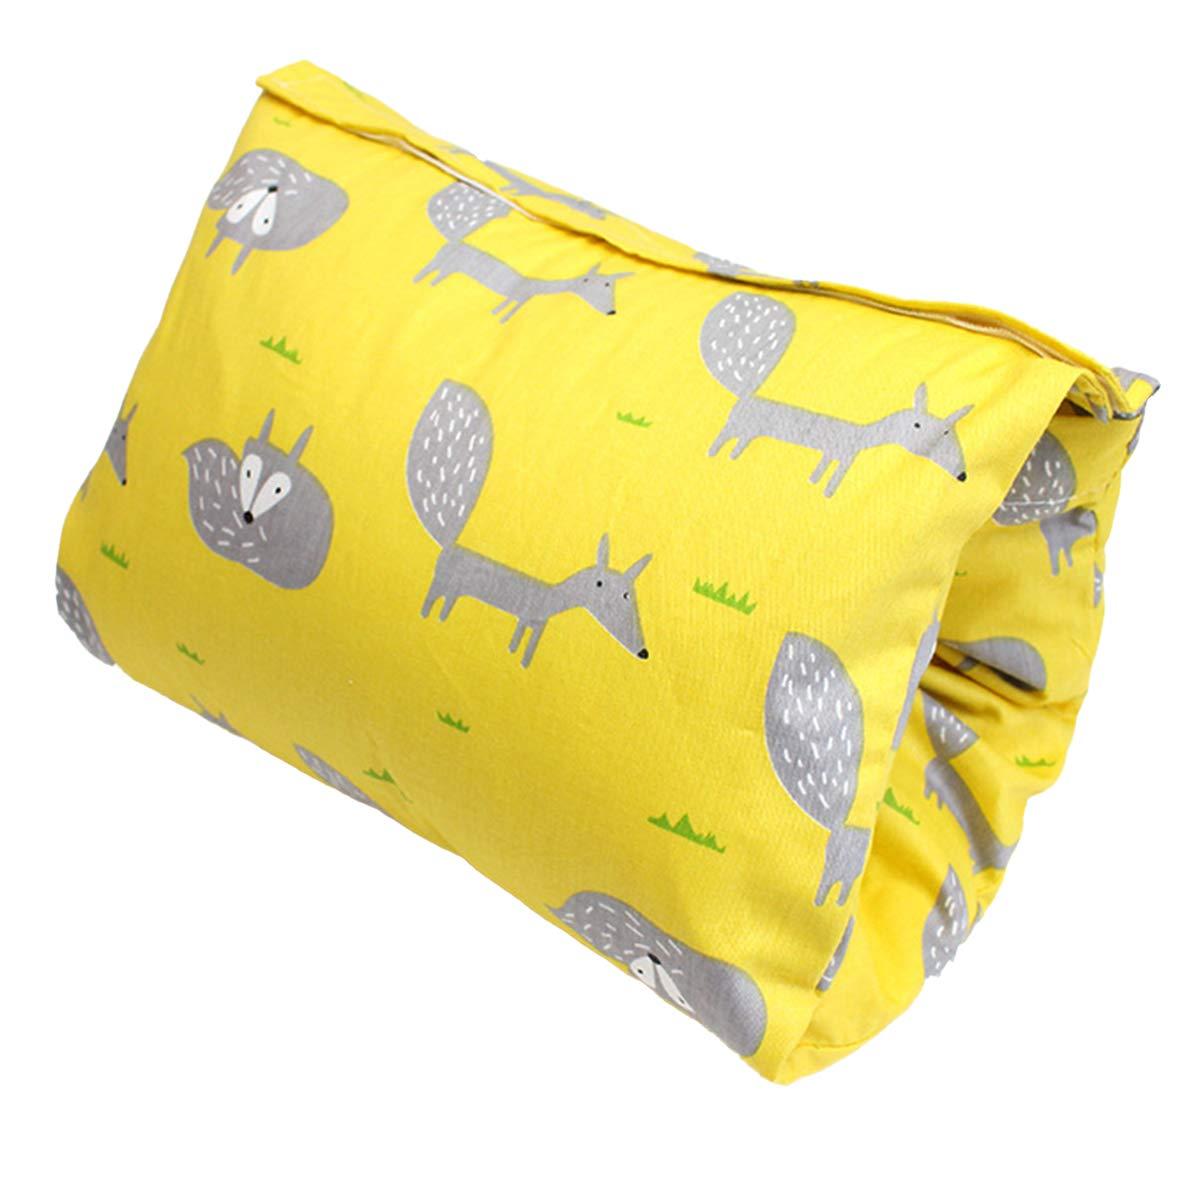 OhhGo Baby Nursing Pillow Breastfeeding Arm Pillow Cushion Washable Arm Rest Pillow